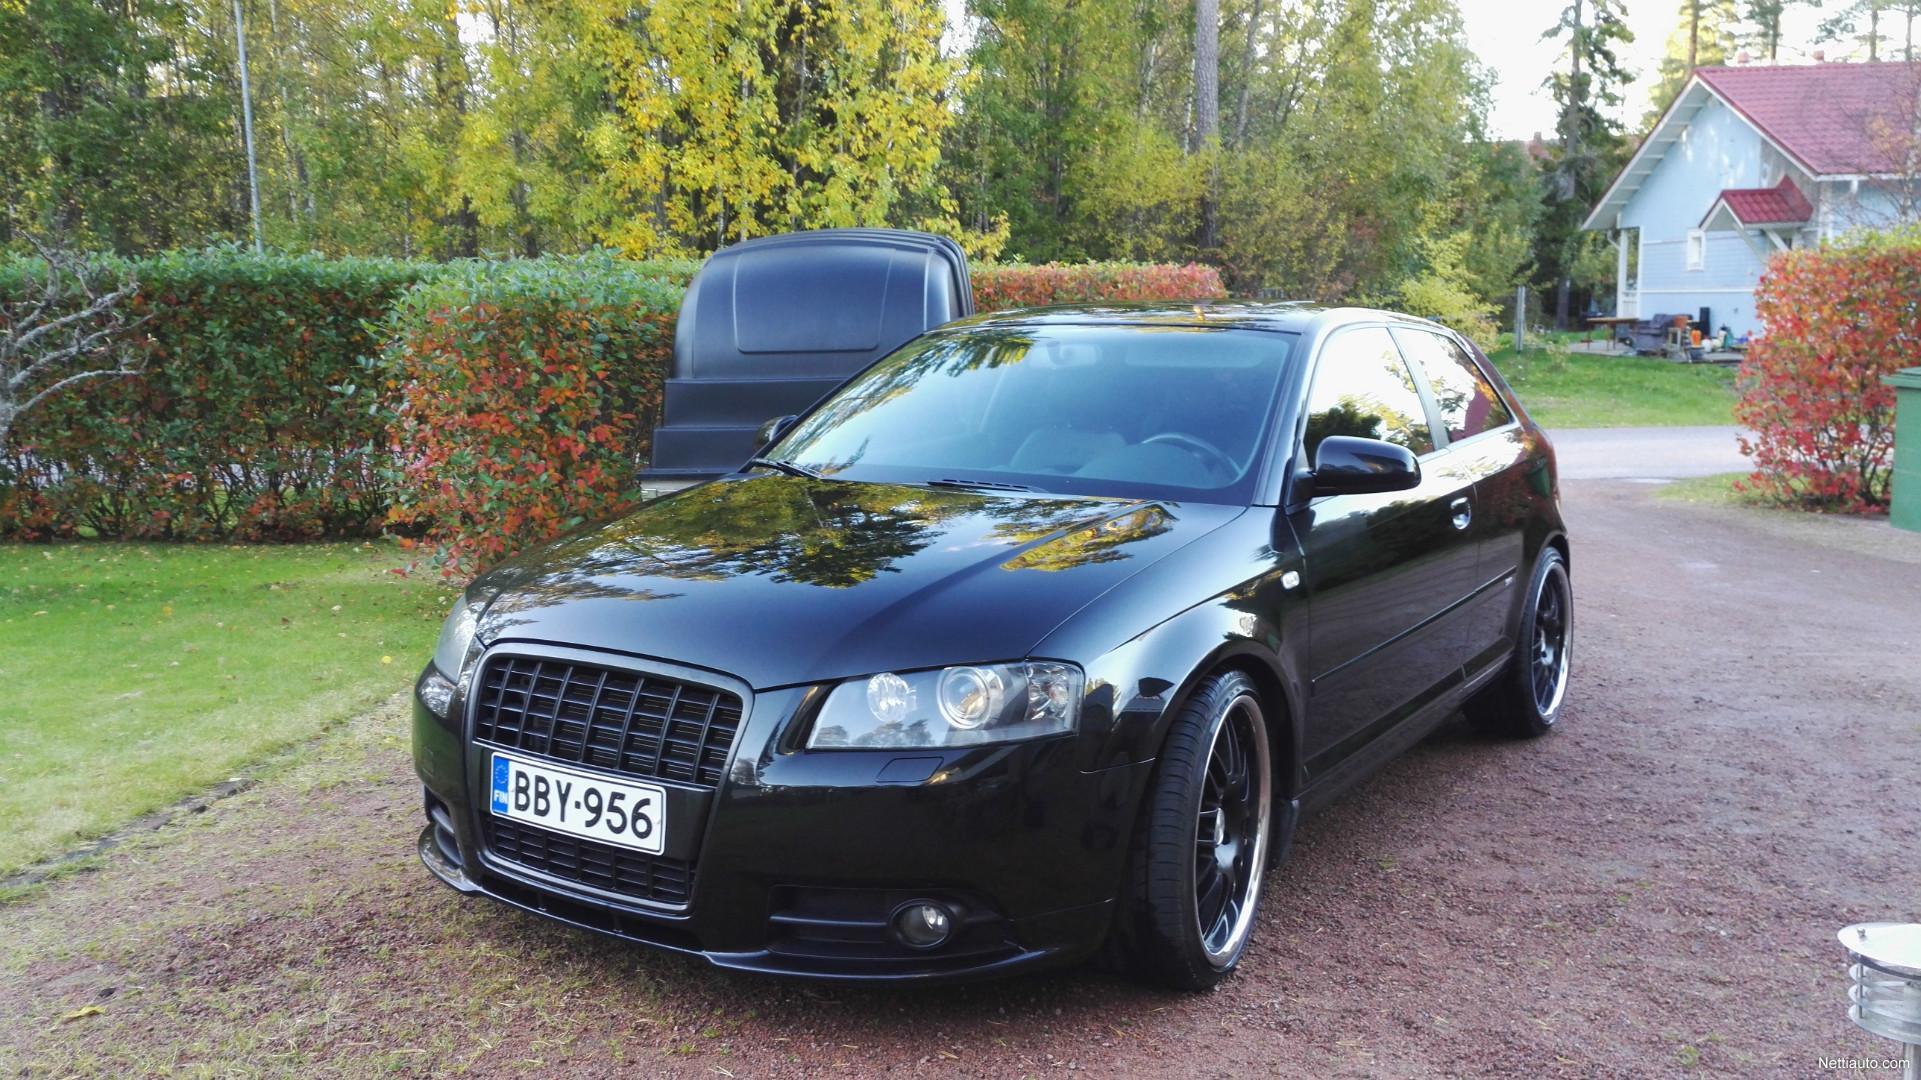 audi a3 2 0 turbo ambition cc 3d quattro hatchback 2006 used vehicle nettiauto. Black Bedroom Furniture Sets. Home Design Ideas